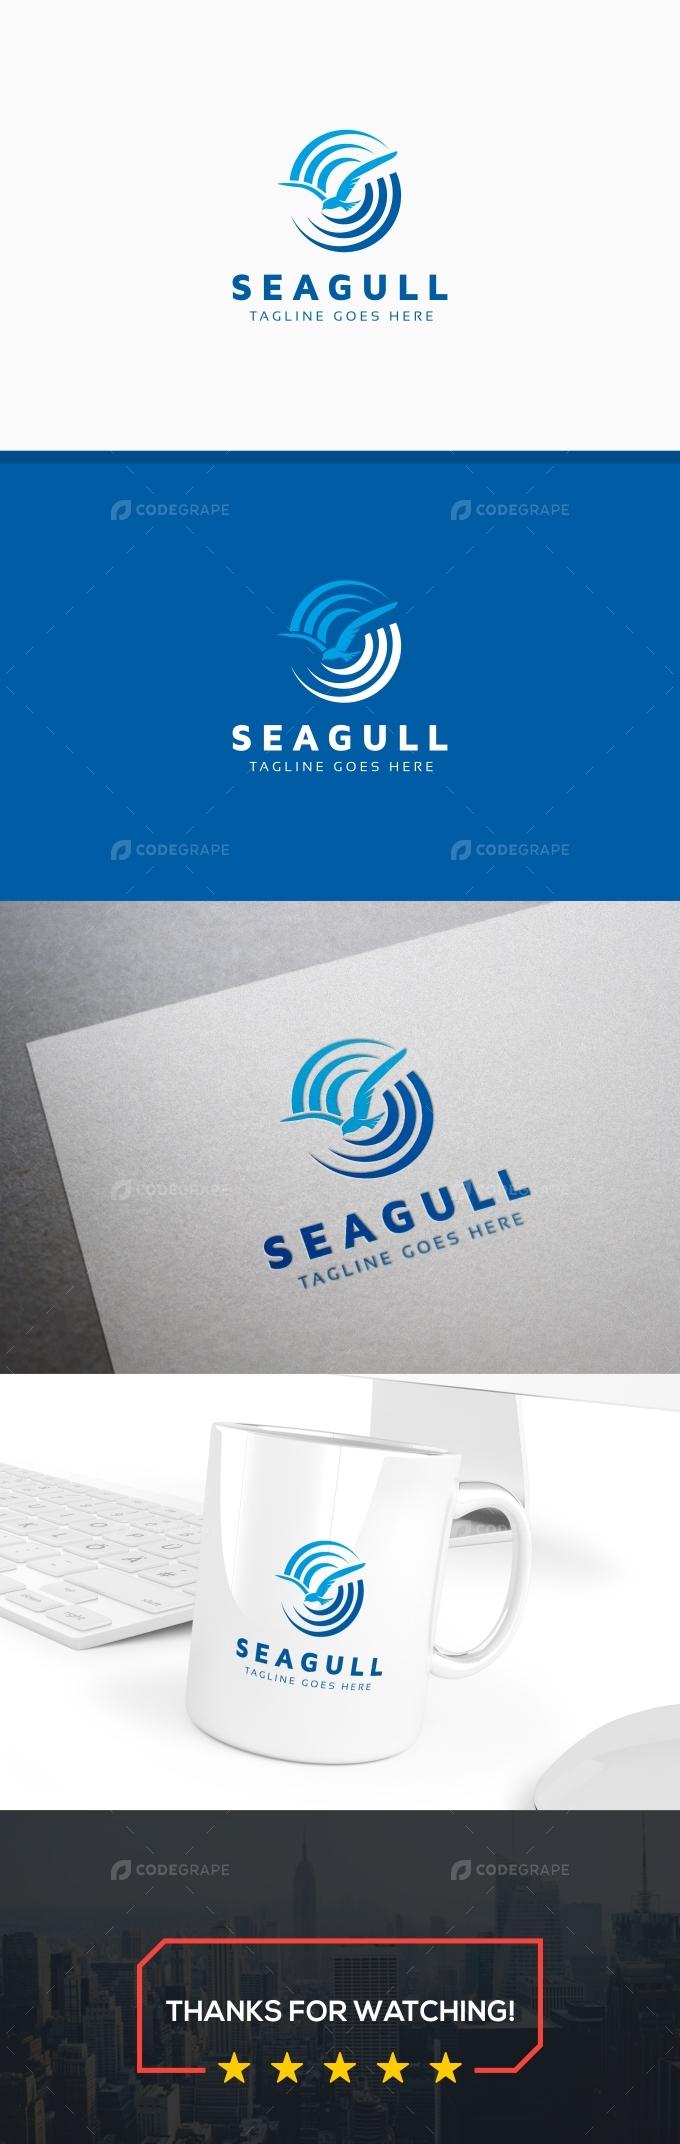 Seagull Logo Template